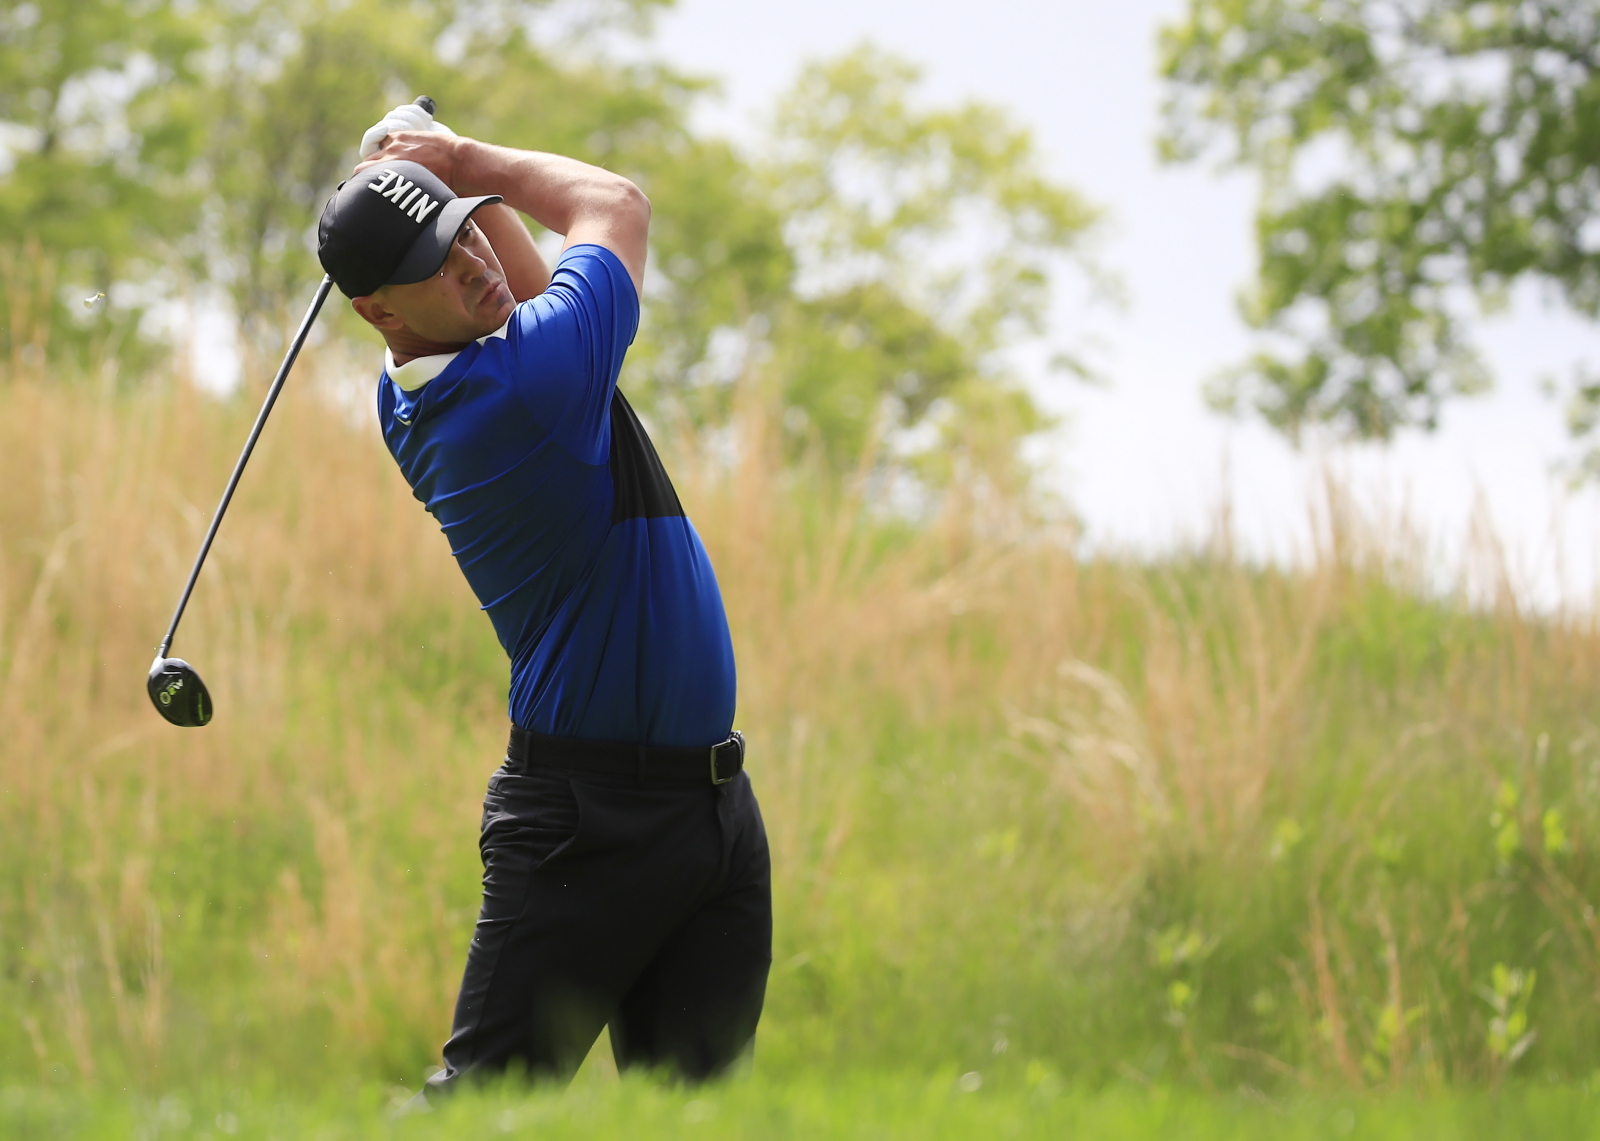 Mecz golfowy w USA. Fot. PAP/EPA/TANNEN MAURY